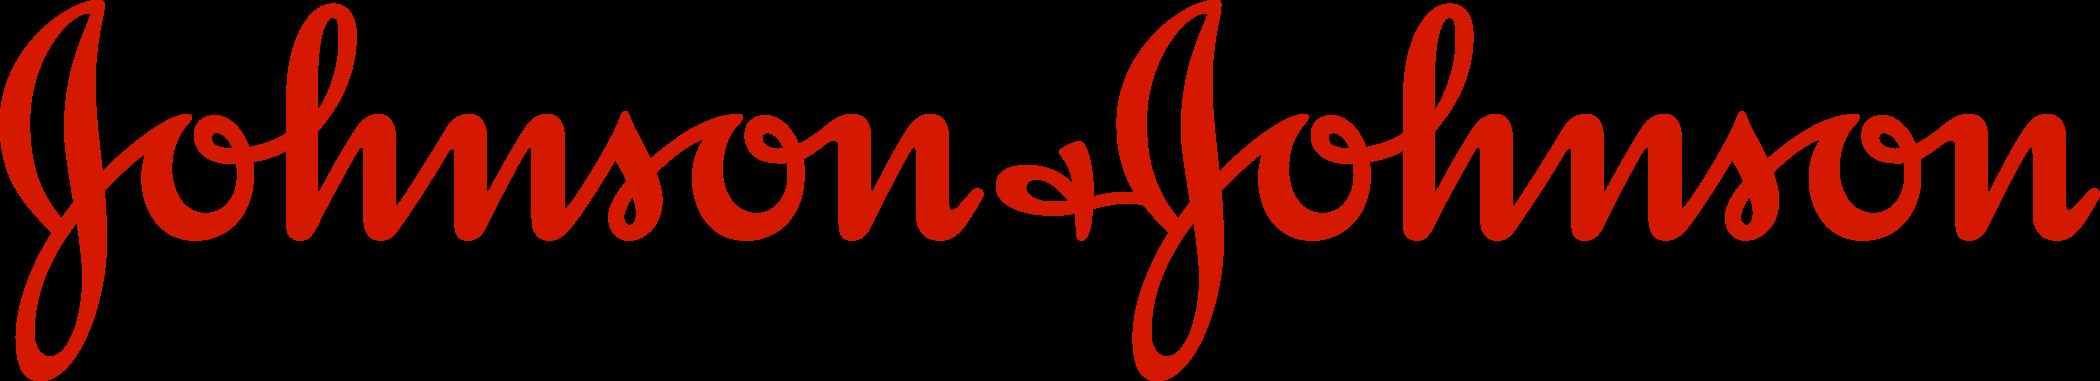 Johnson & Johnson Logo.